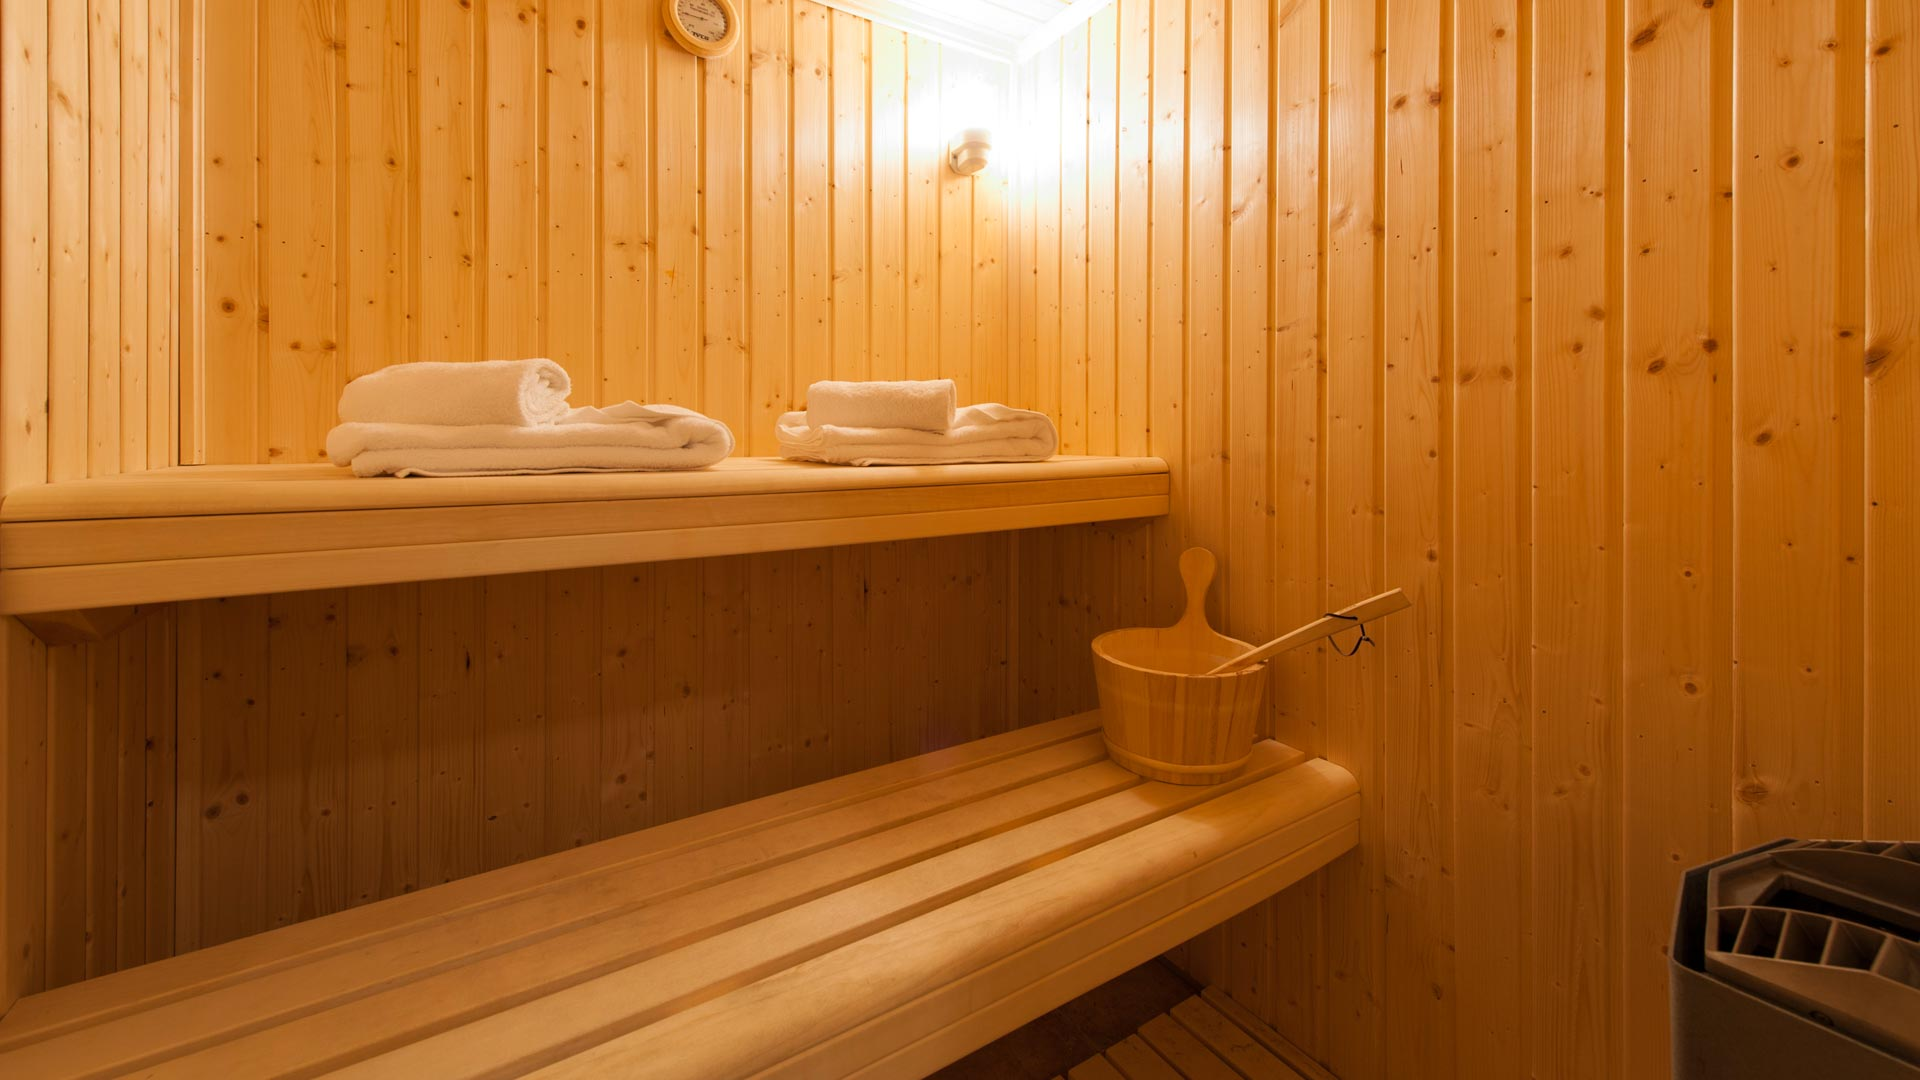 Sauna in La Vanoise Chalet in Ste Foy